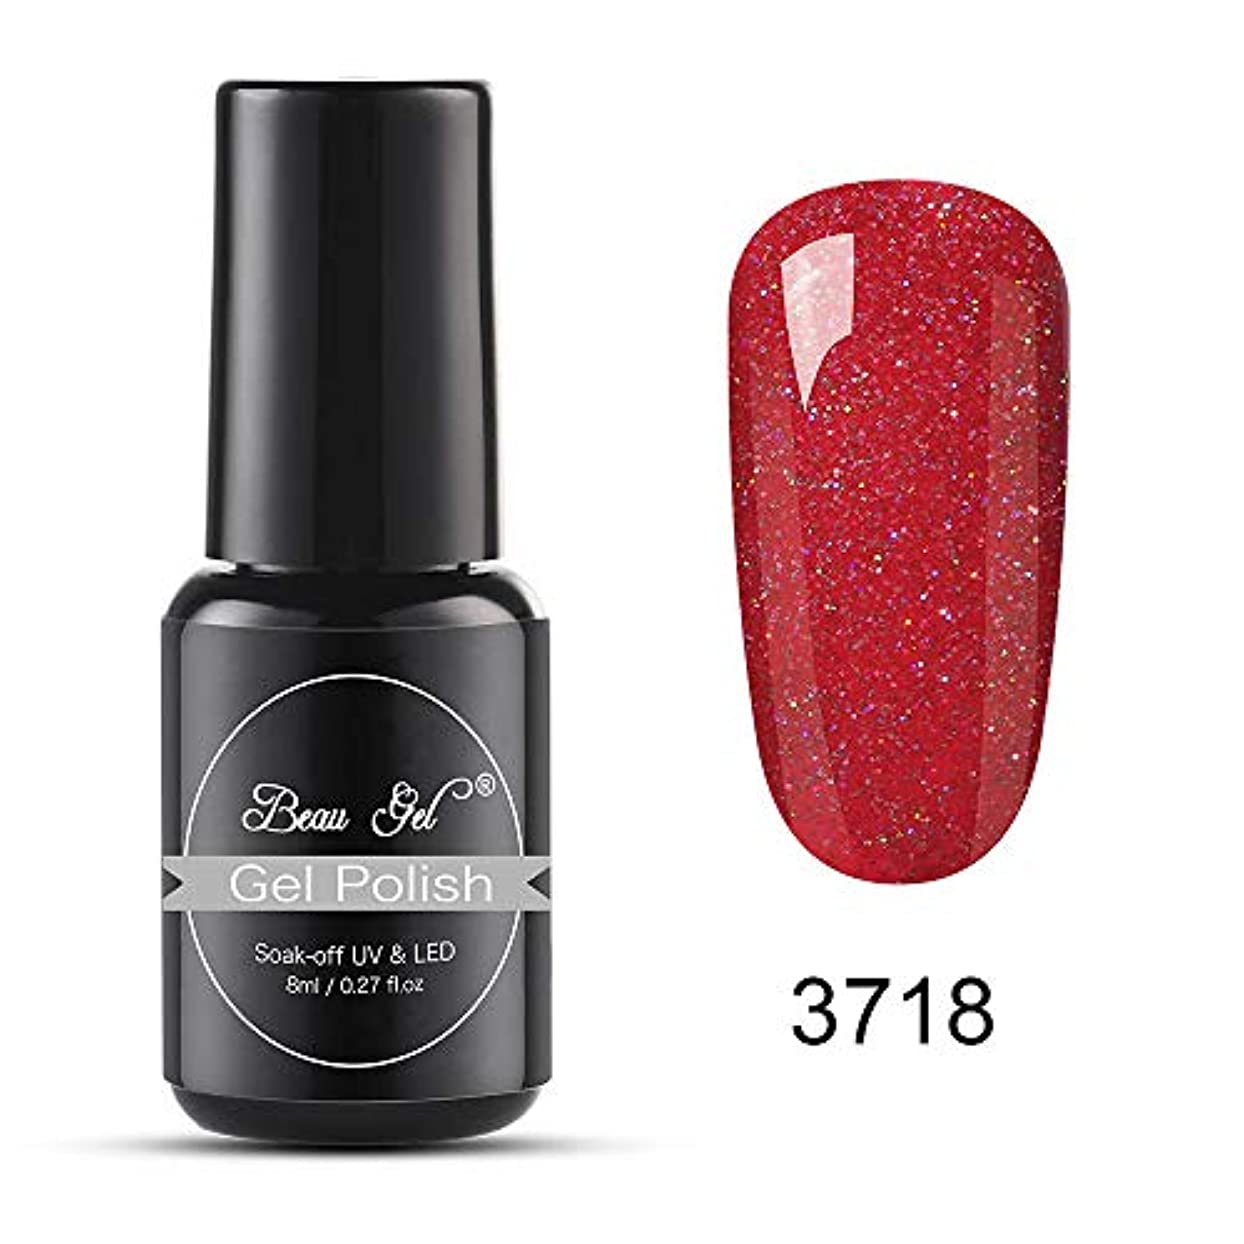 Beau gel ジェルネイル カラージェル 虹系 1色入り 8ml-3718